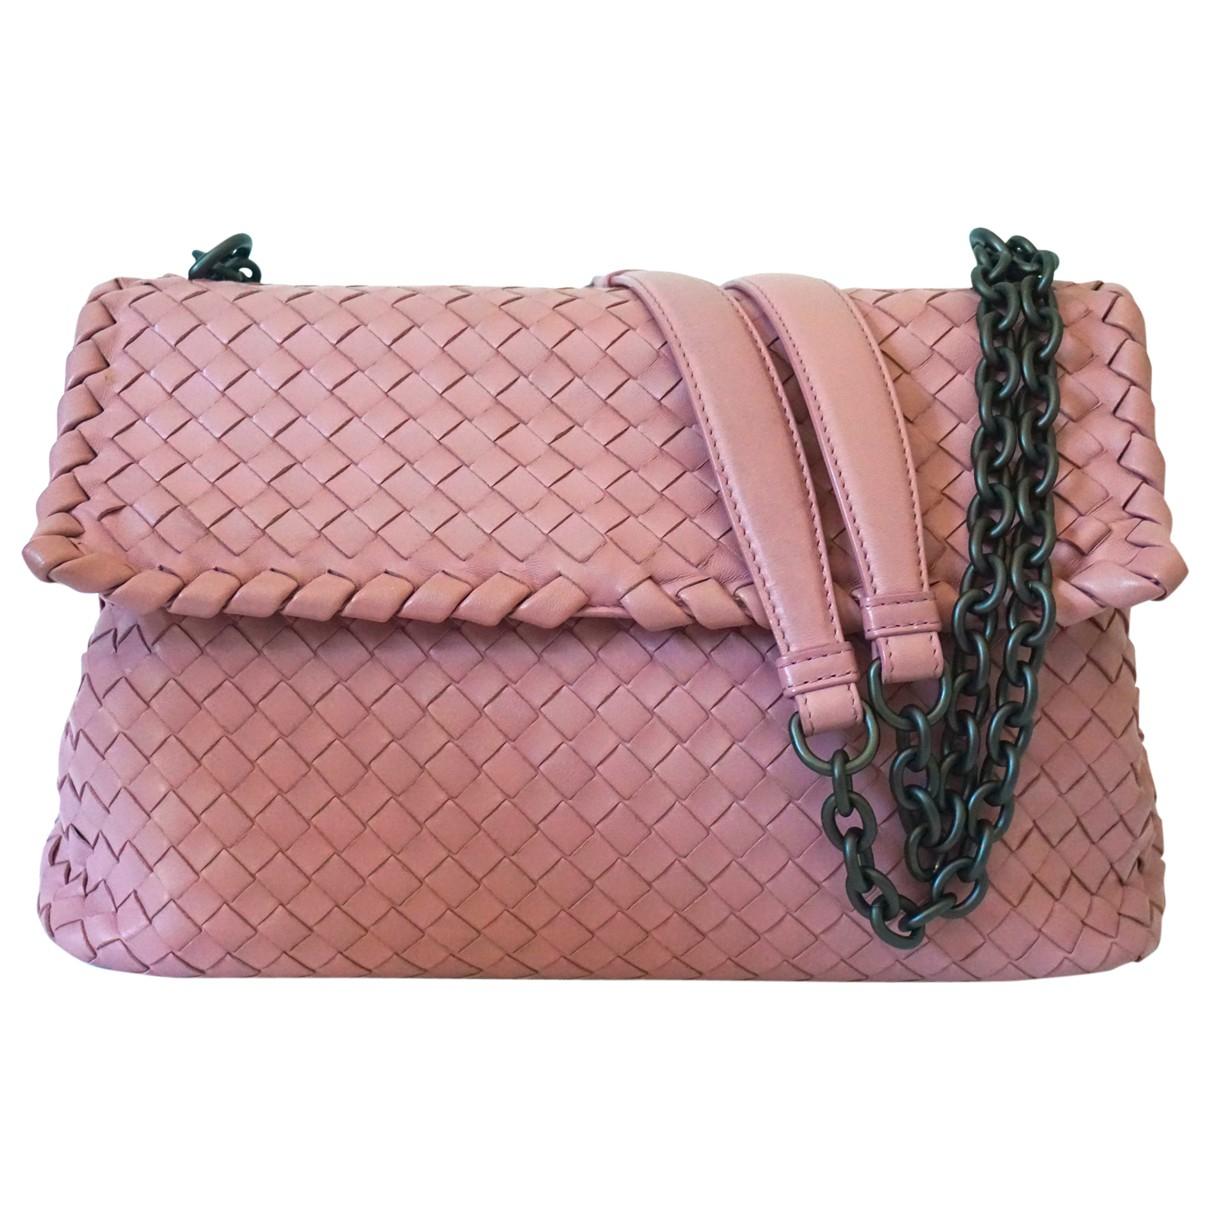 Bottega Veneta - Sac a main Olimpia pour femme en cuir - rose